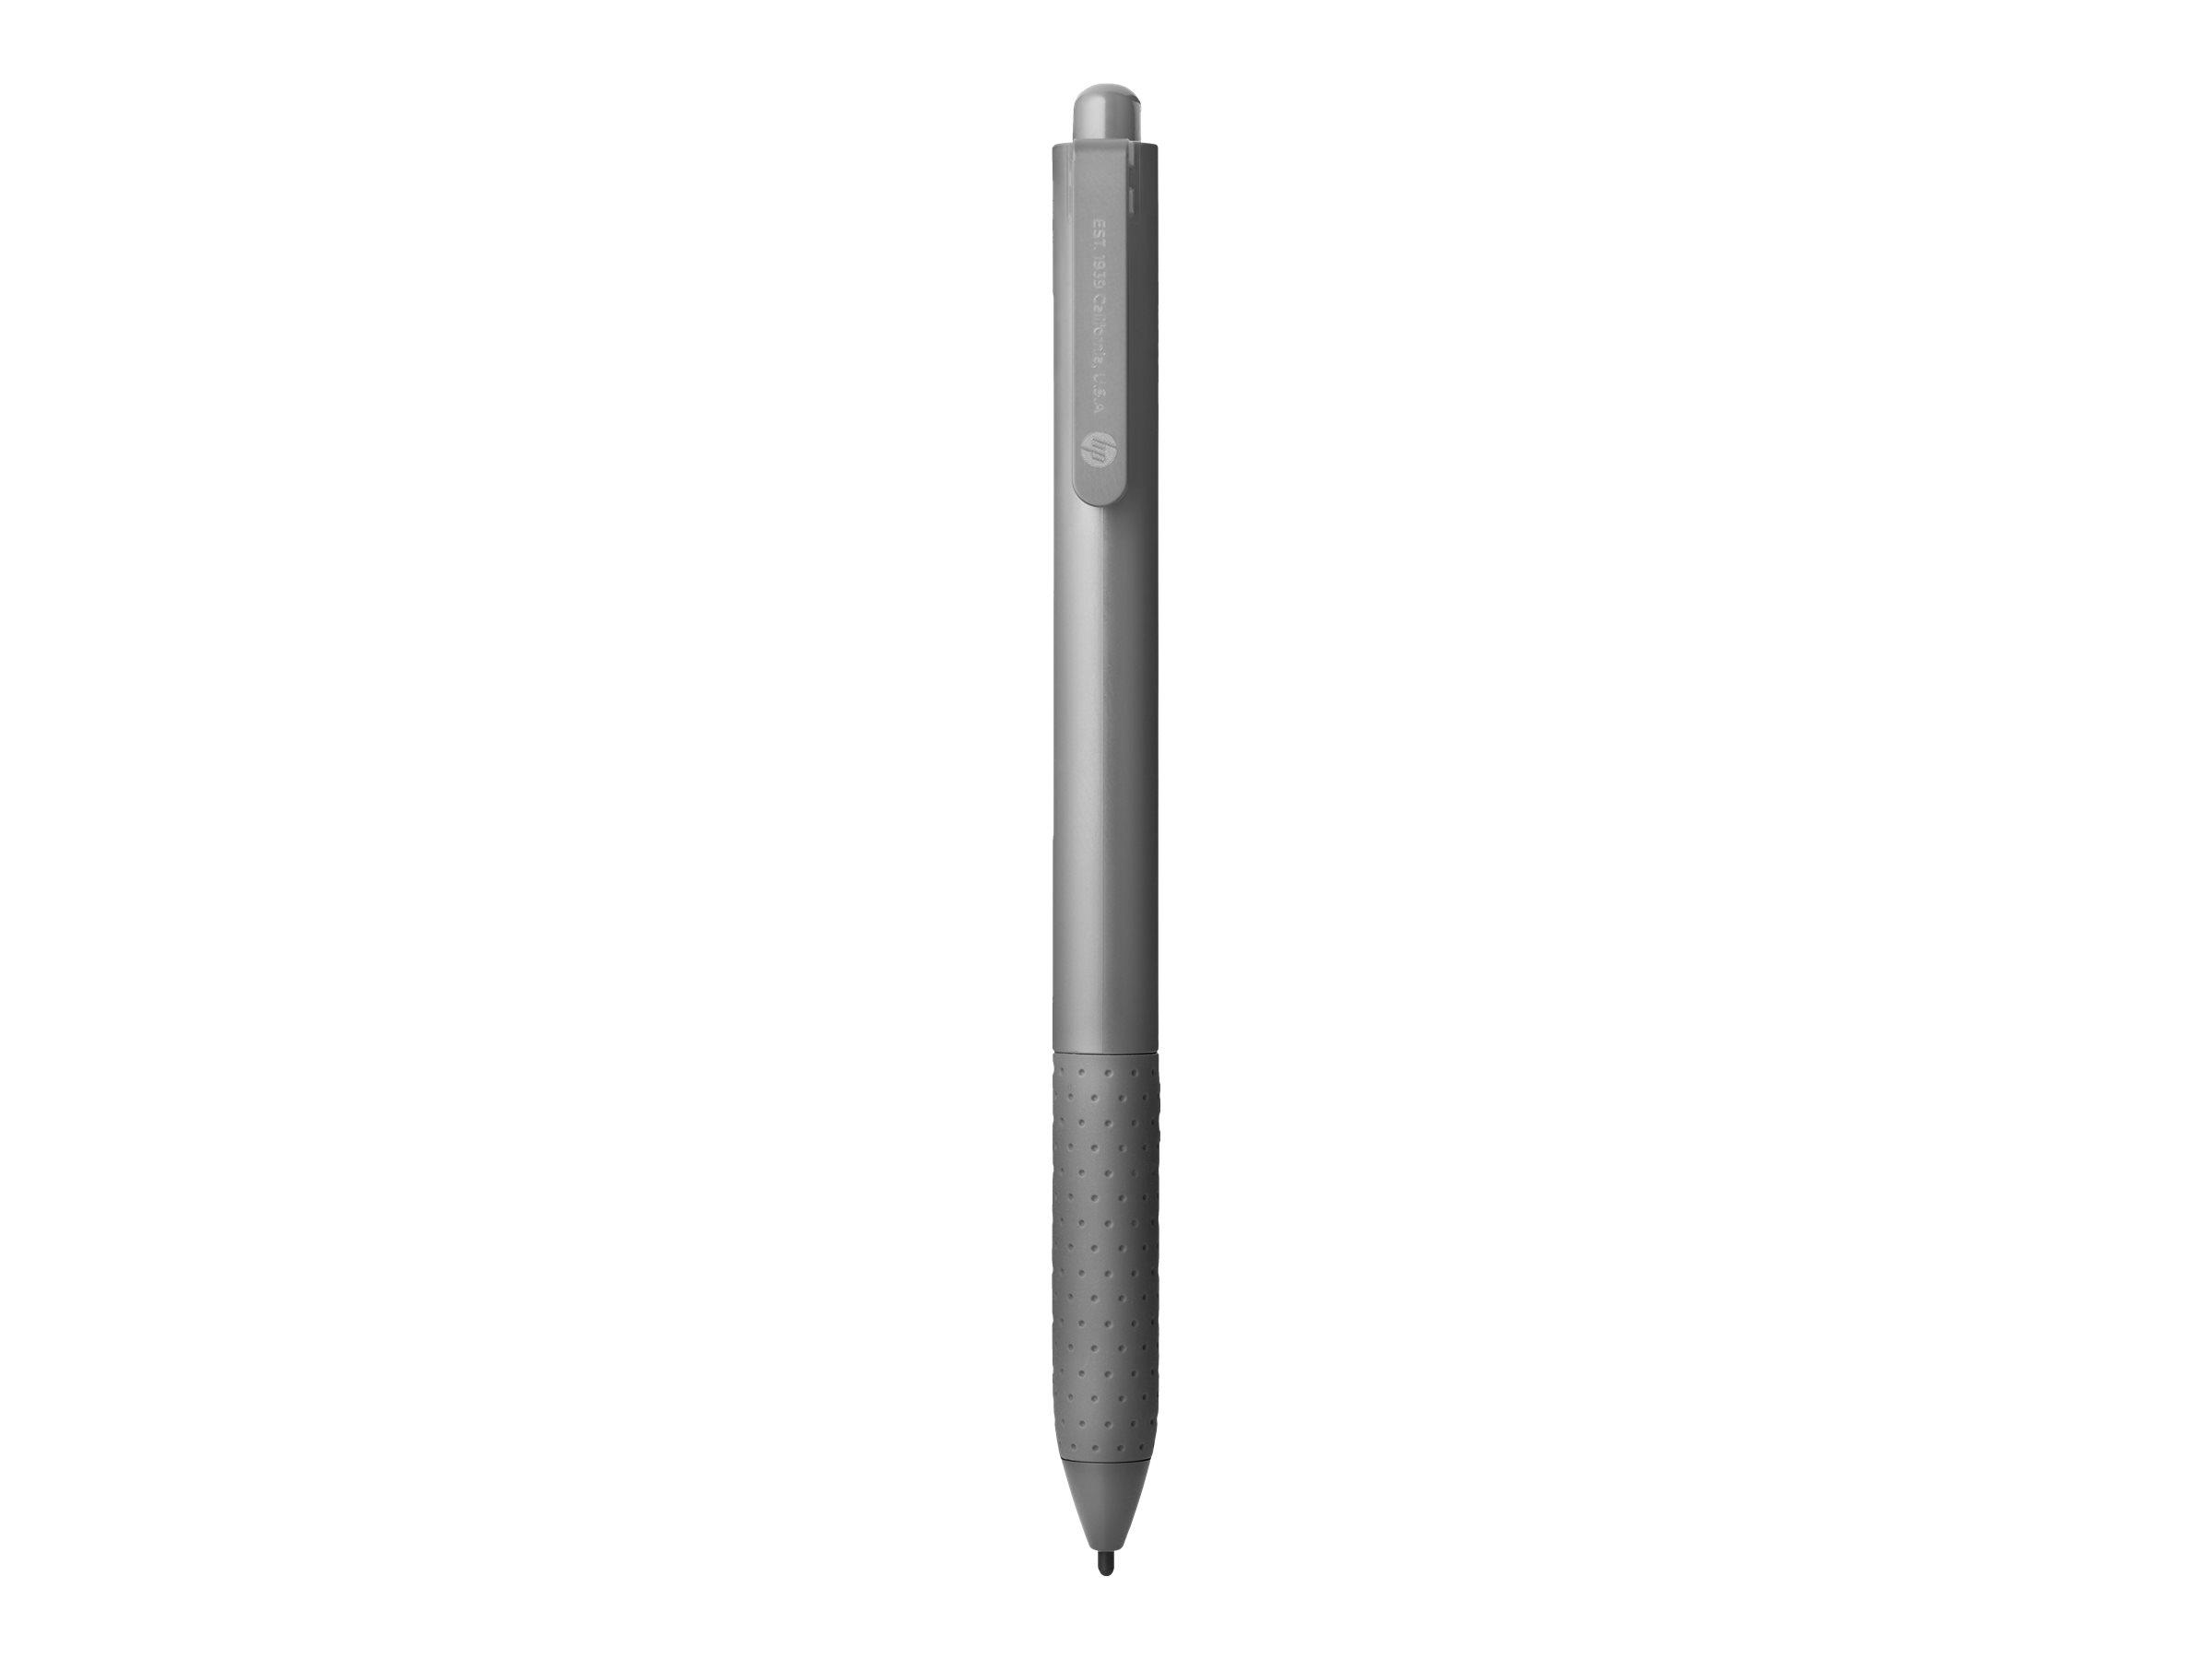 HP x360 11 EMR - Stift - für Chromebook x360 11 G1 (Education Edition)